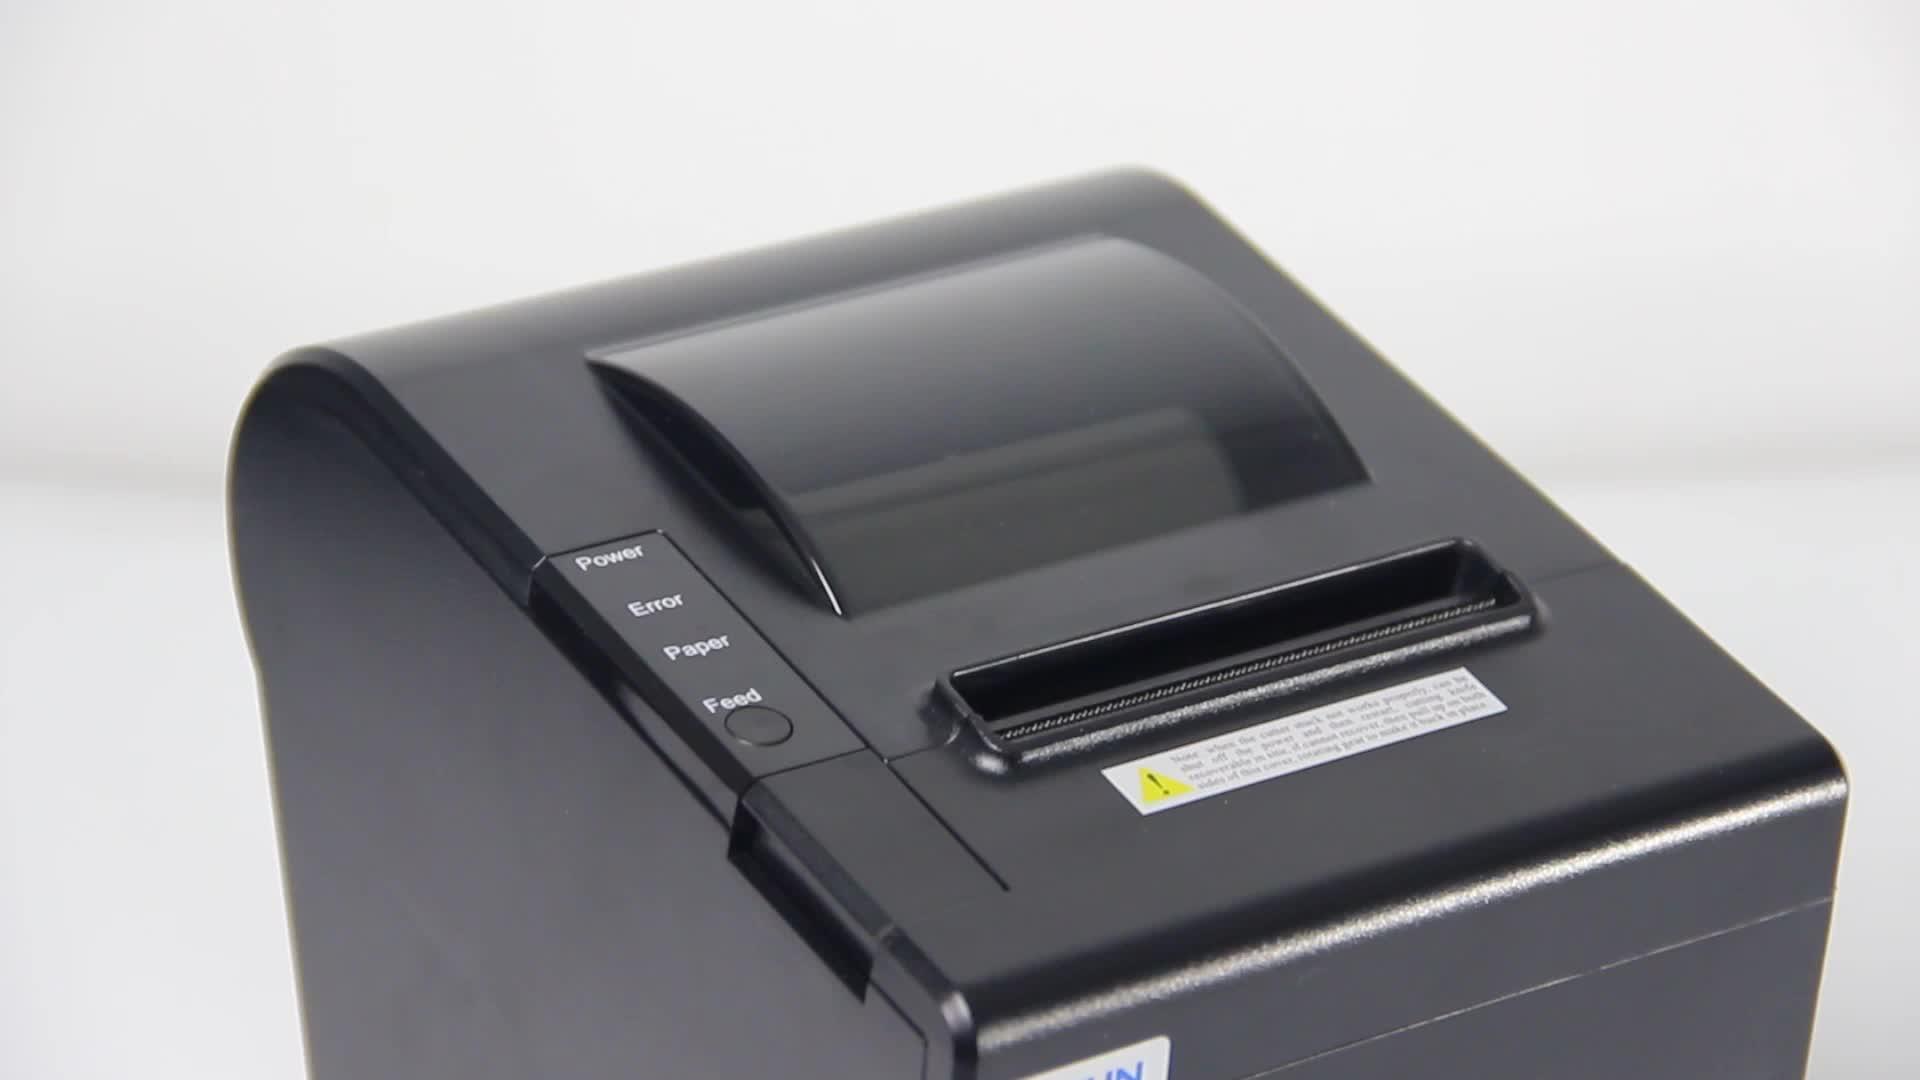 RS232/USB/Bluetooth 80 MILLIMETRI POS Termica per PrinterAndroid Stampante Termica per Ricevute